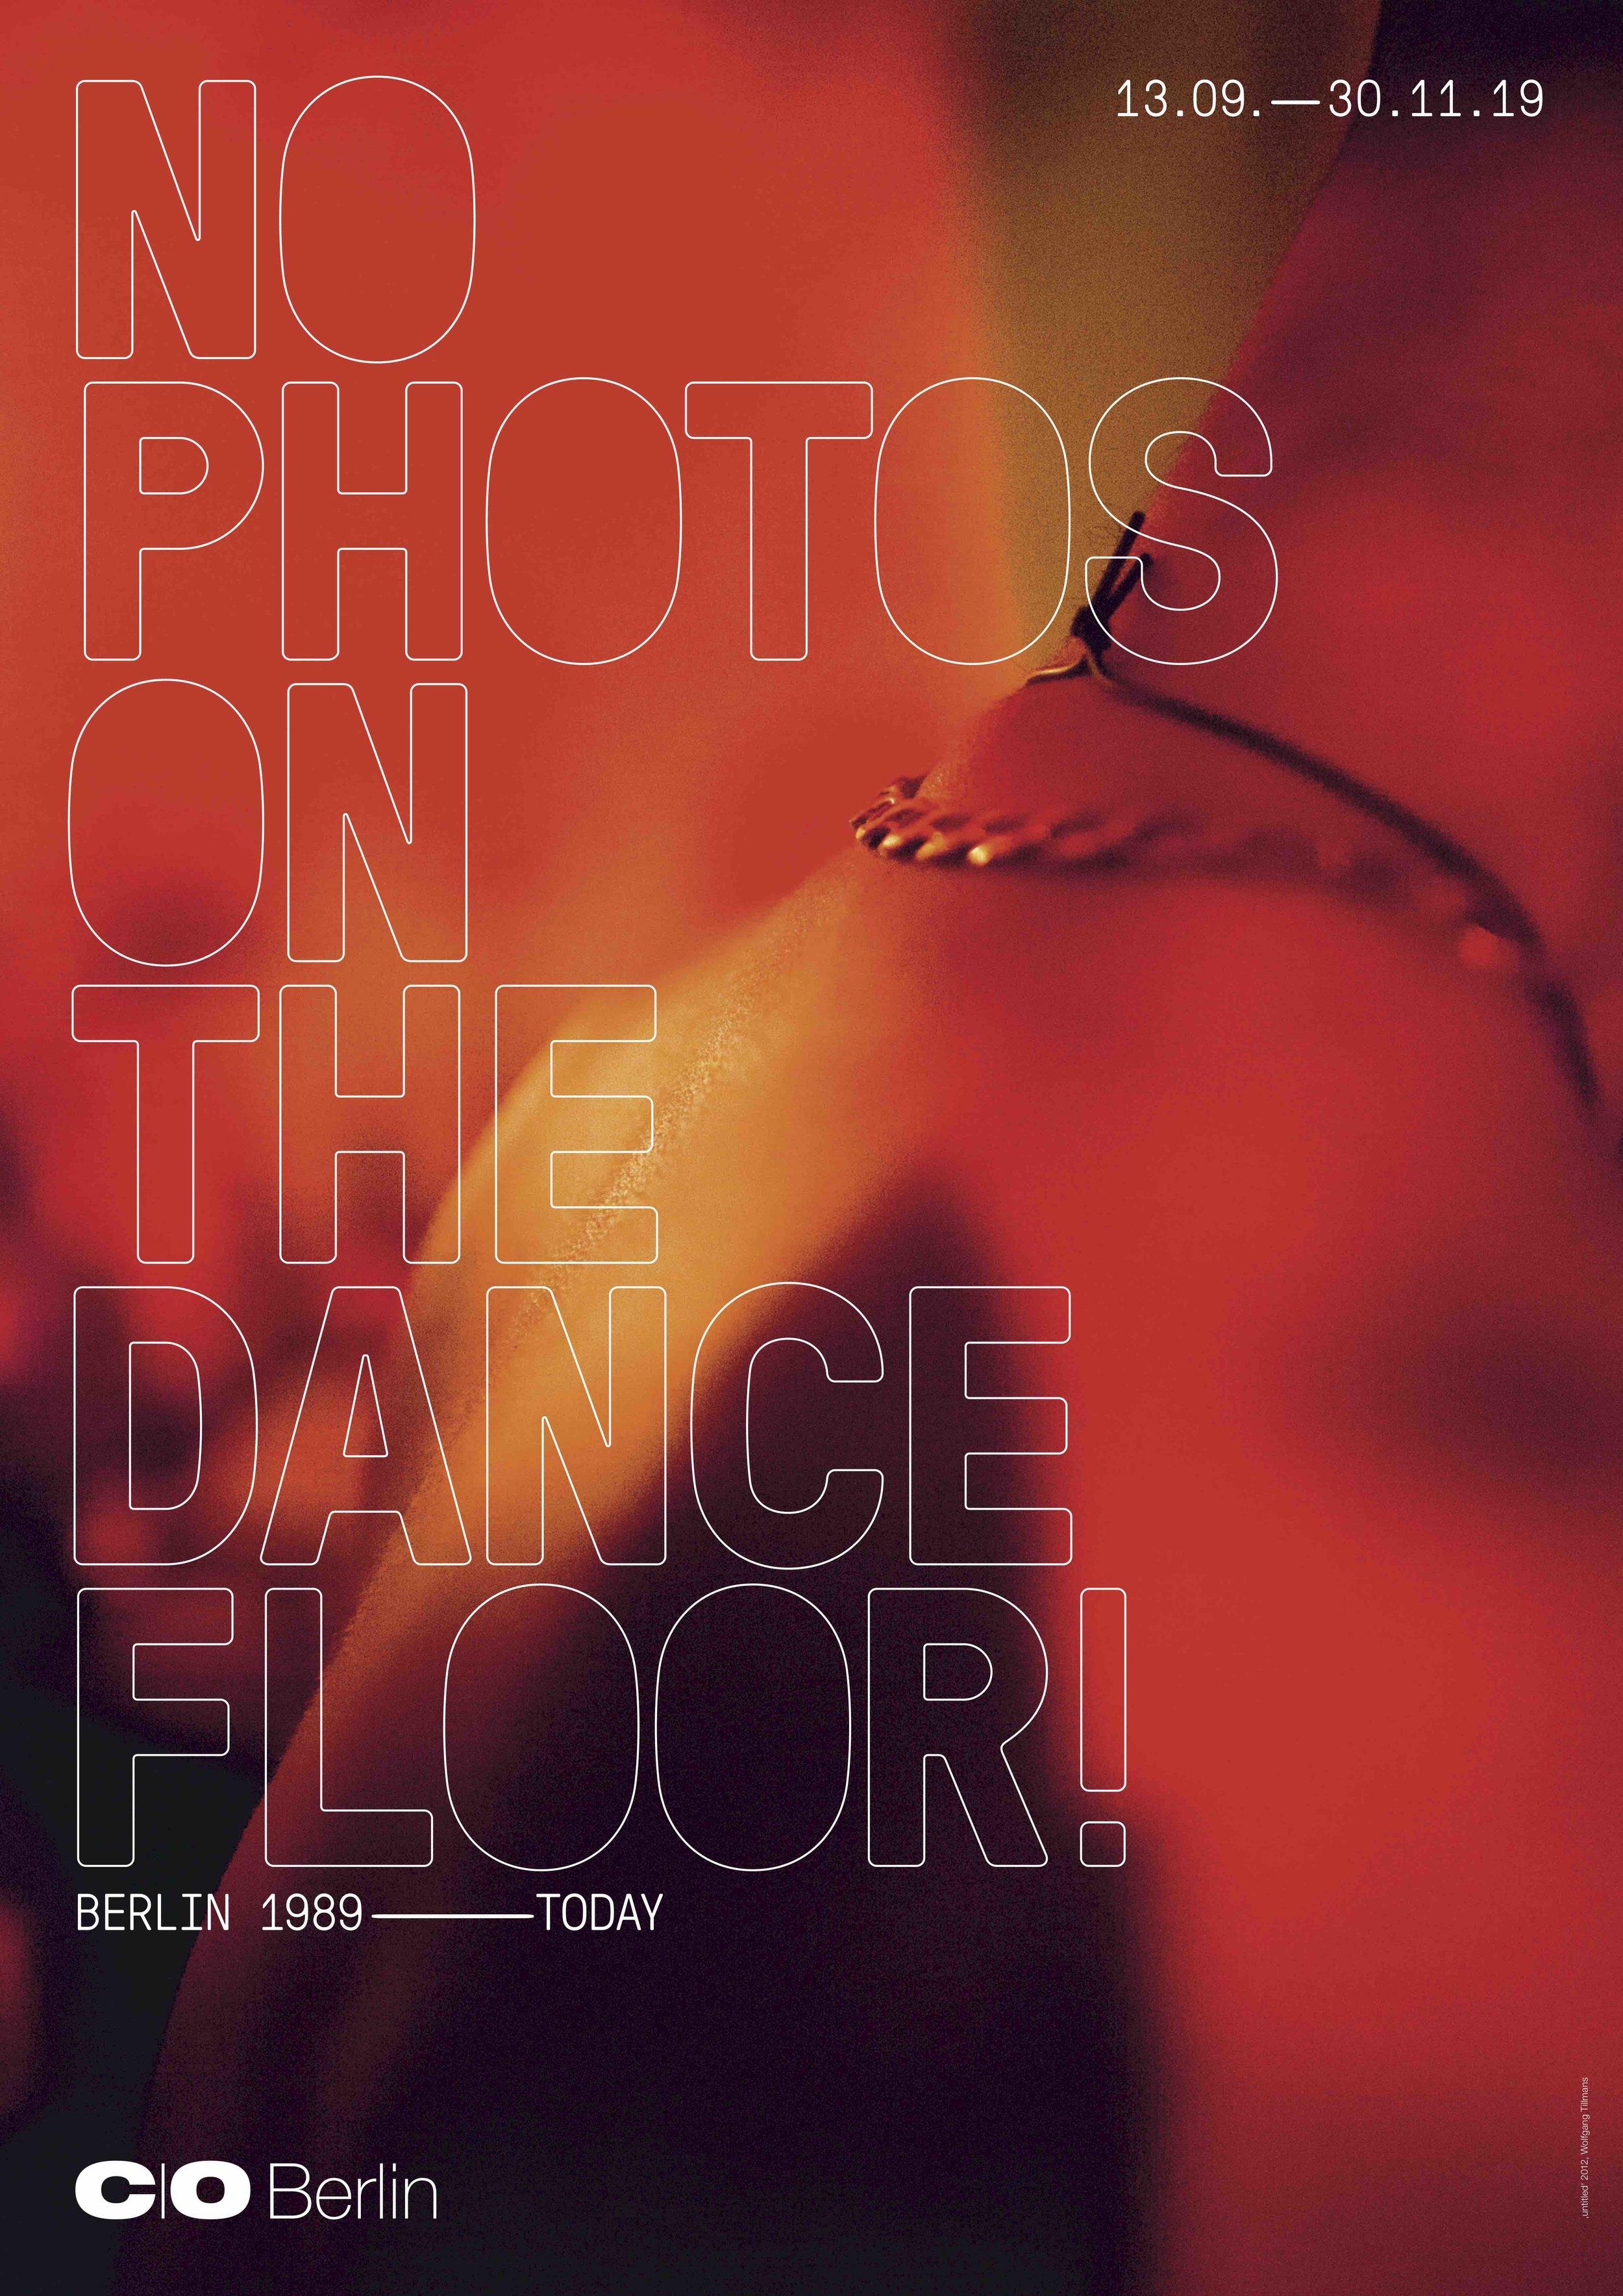 NO PHOTOS ON THE DANCE FLOOR!